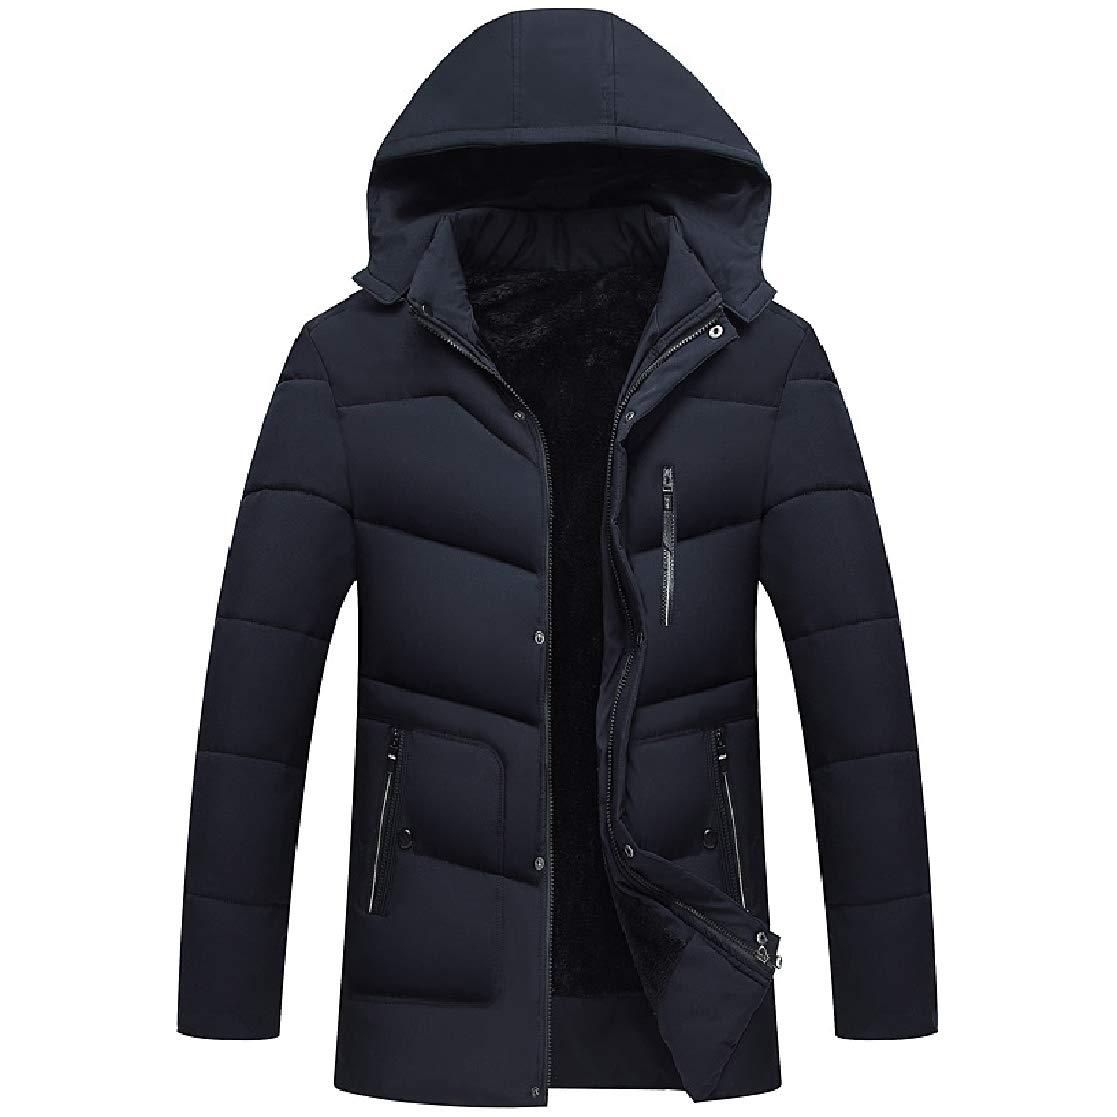 YUNY Men Open Front Thick Fit Brumal Zip-up Hood Down Outwear Coat Navy Blue M